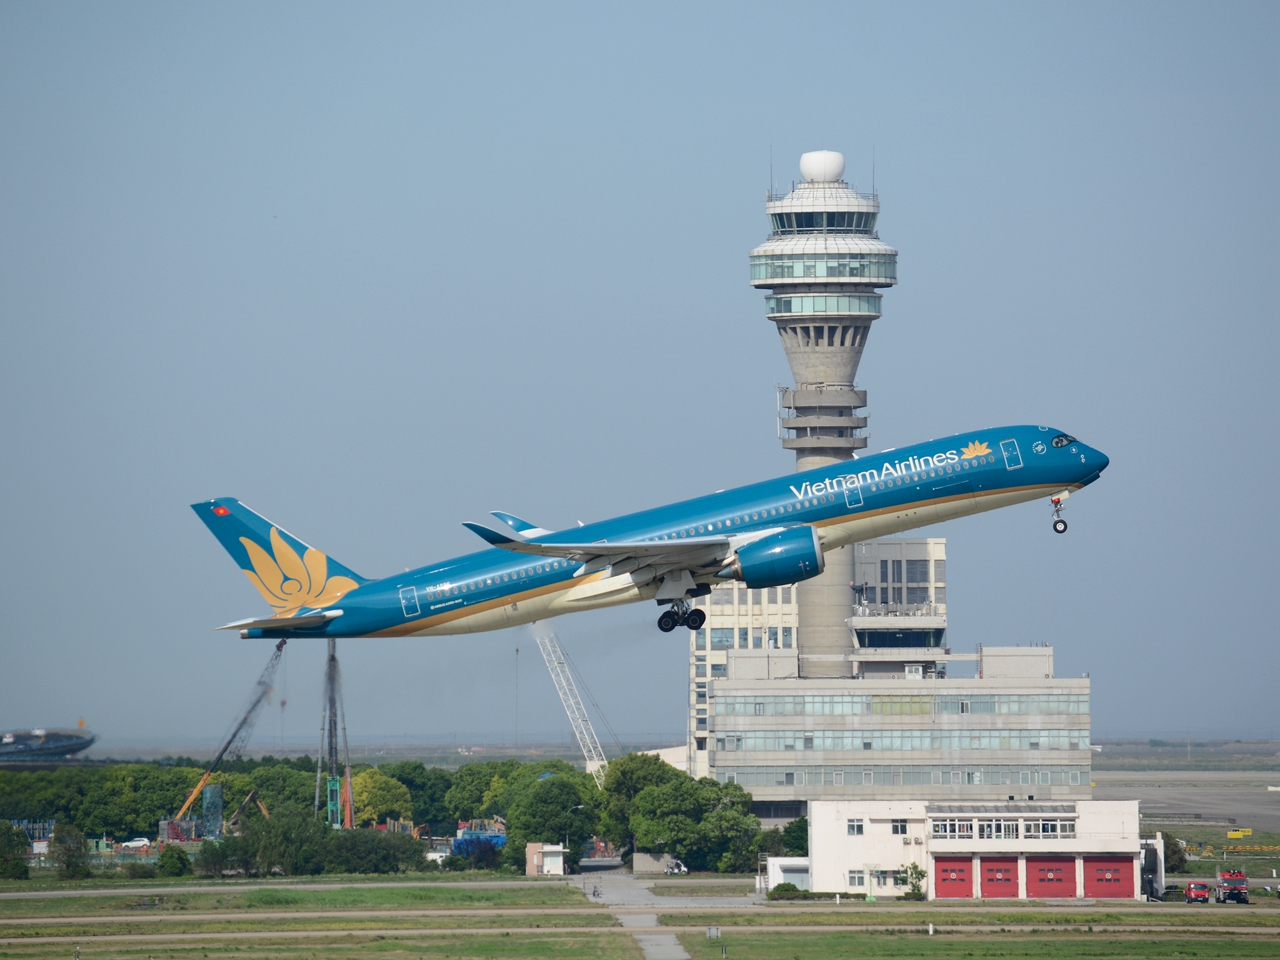 Re:[原创](多图一机)西班牙航空PVG起飞 后面有彩蛋 AIRBUS A350-900 VN-A886 上海浦东国际机场